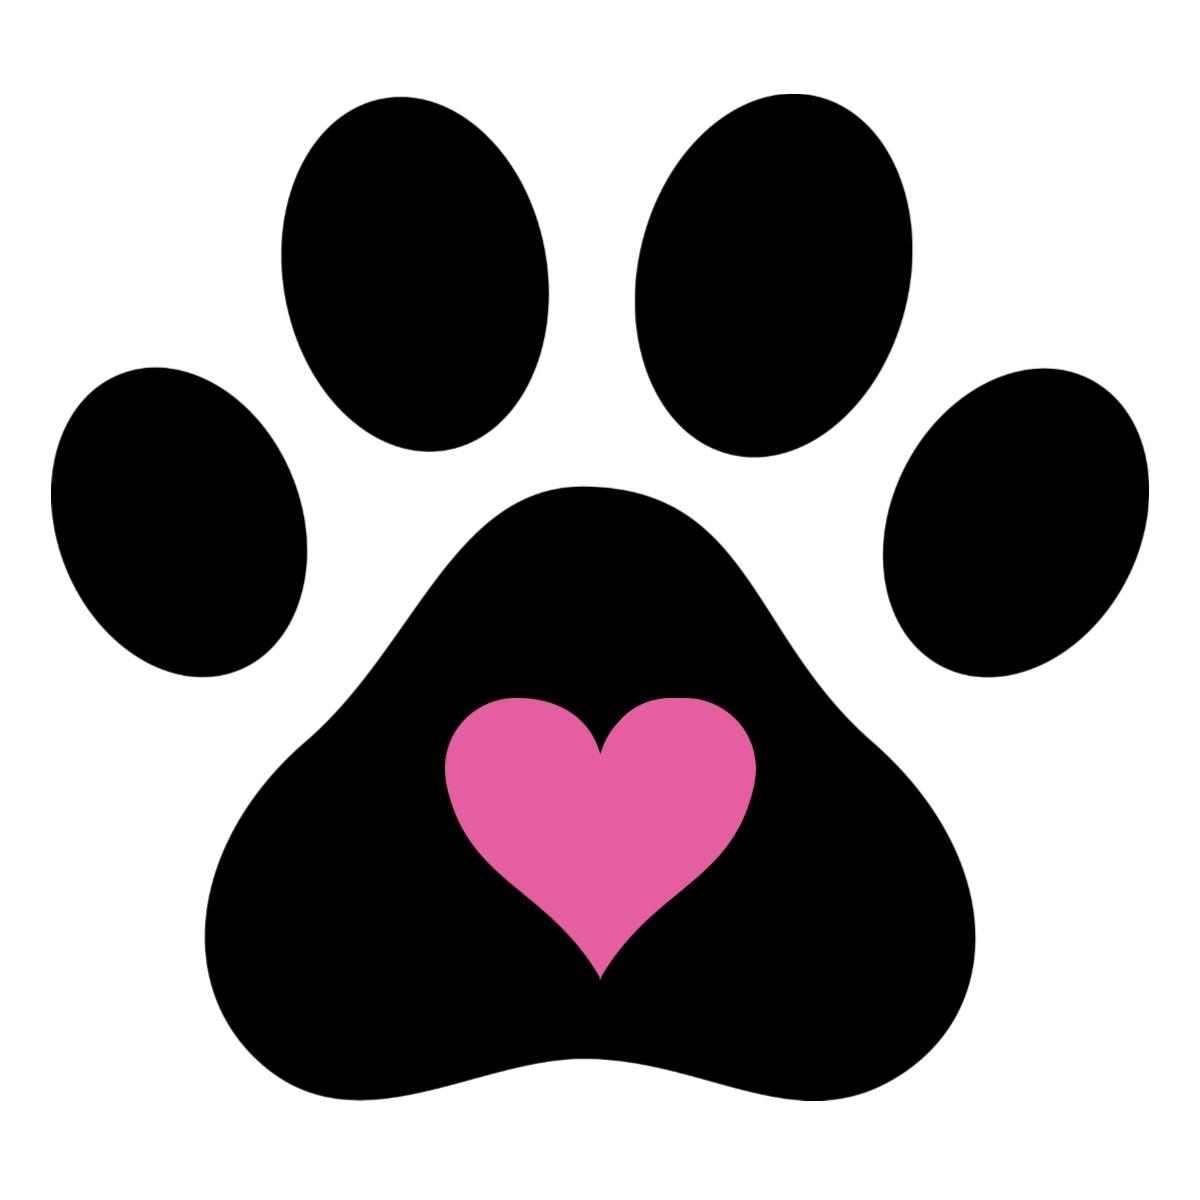 Puppy Party Sleepovers LLC - Peachtree City, GA - Pet Sitting & Exercising